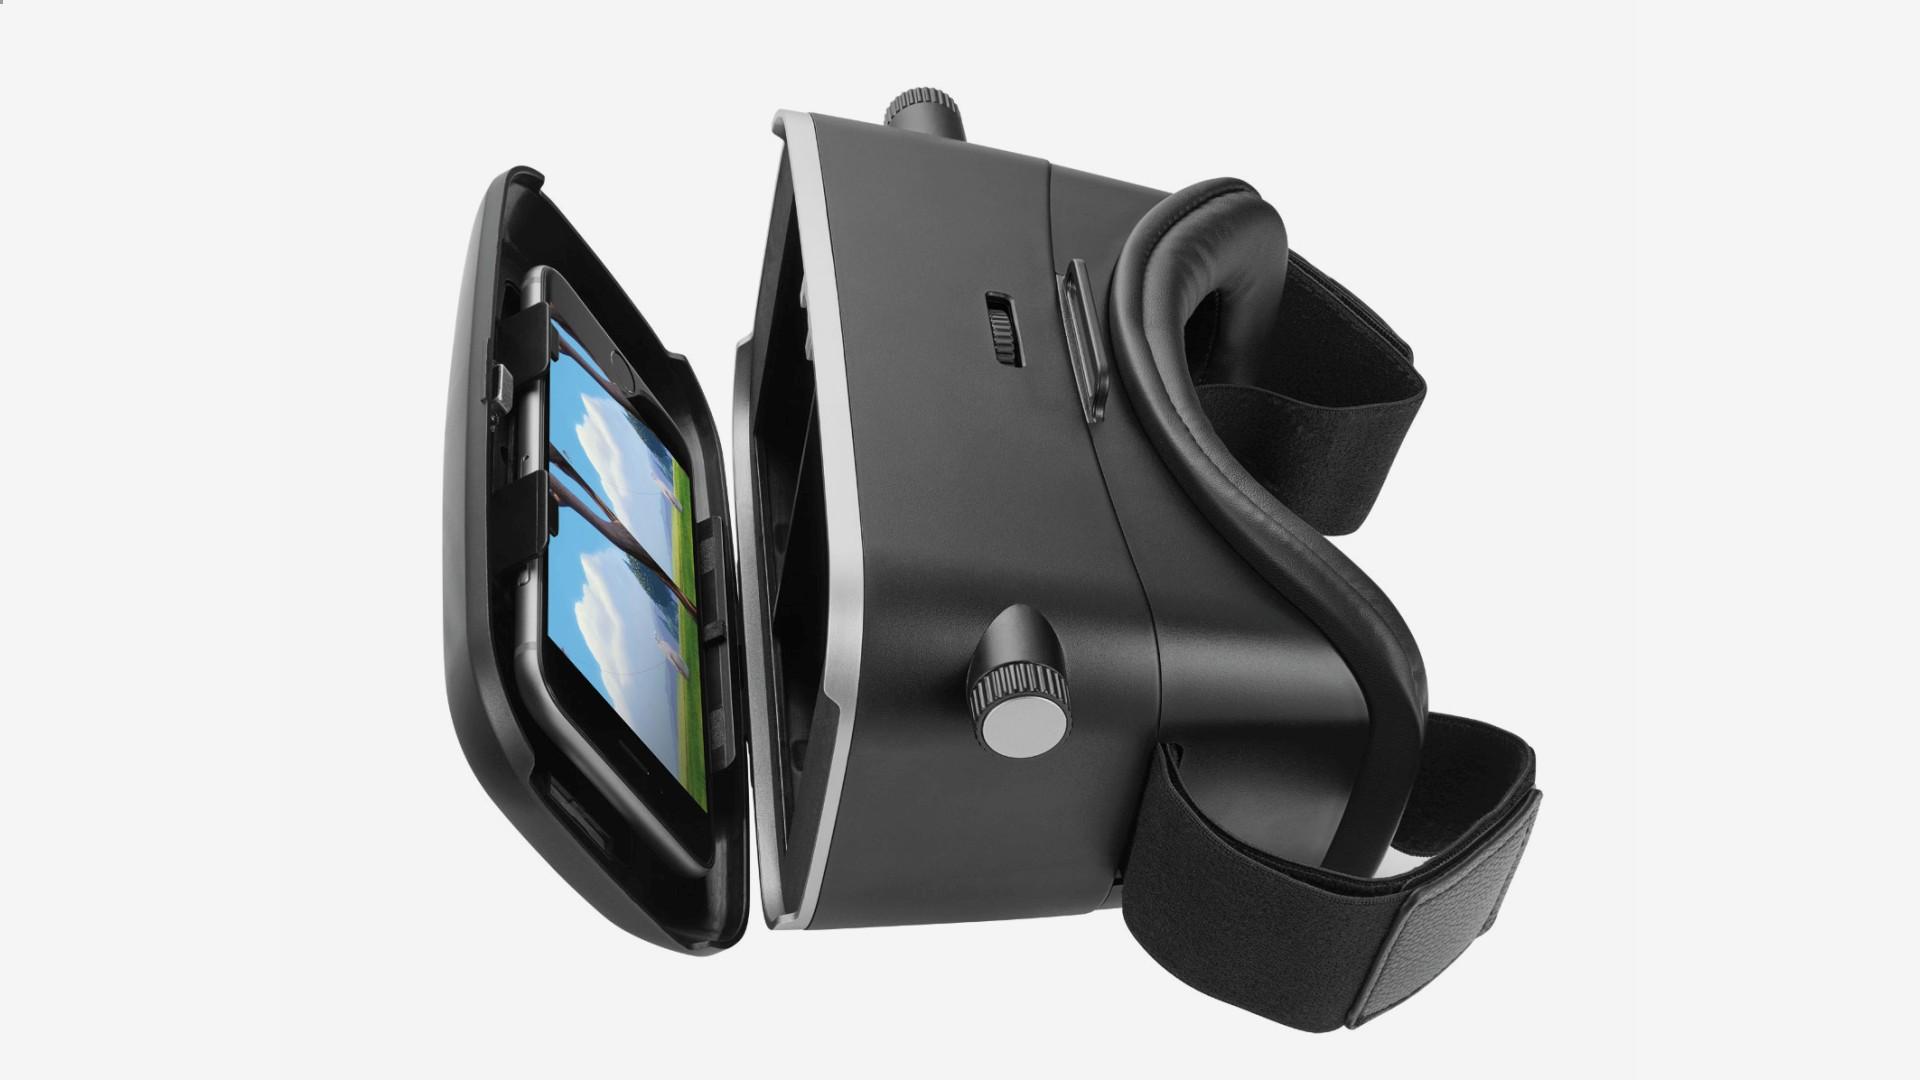 15e92d8fd Trust Exos 3D: okuliare pre virtuálnu realitu za 50 eur